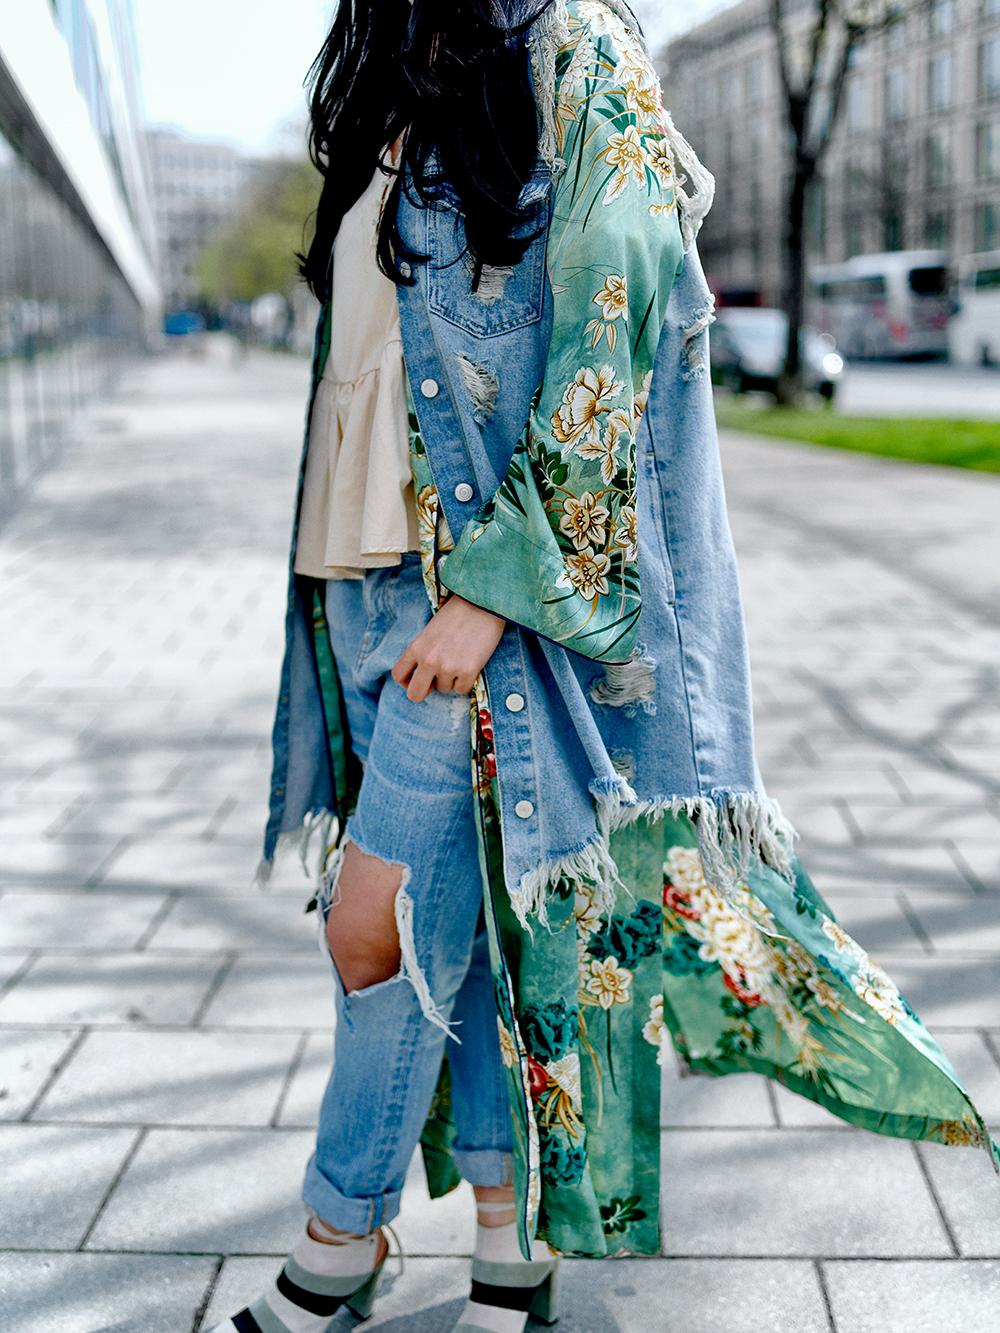 fashionambit-fashionblog-muenchen-modeblog-deutschland-blogger-modeblogger-fashionblogger-bloggerdeutschland-lifestyleblog-munich-style-blog-offene-schuhe-look